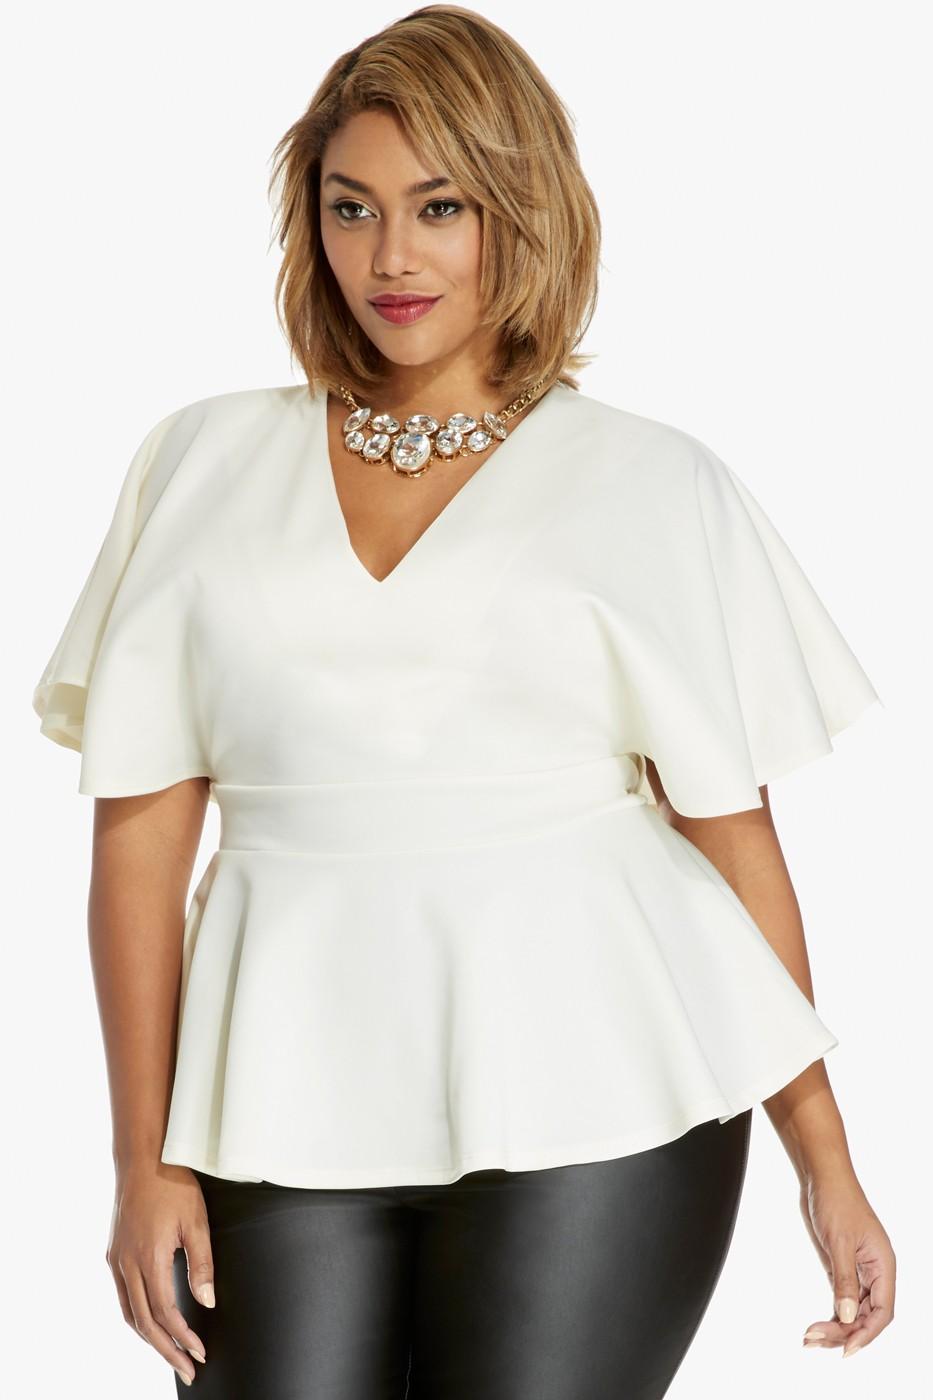 plus size peplum top plus size darling batwing peplum top | fashion to figure wfyvdud